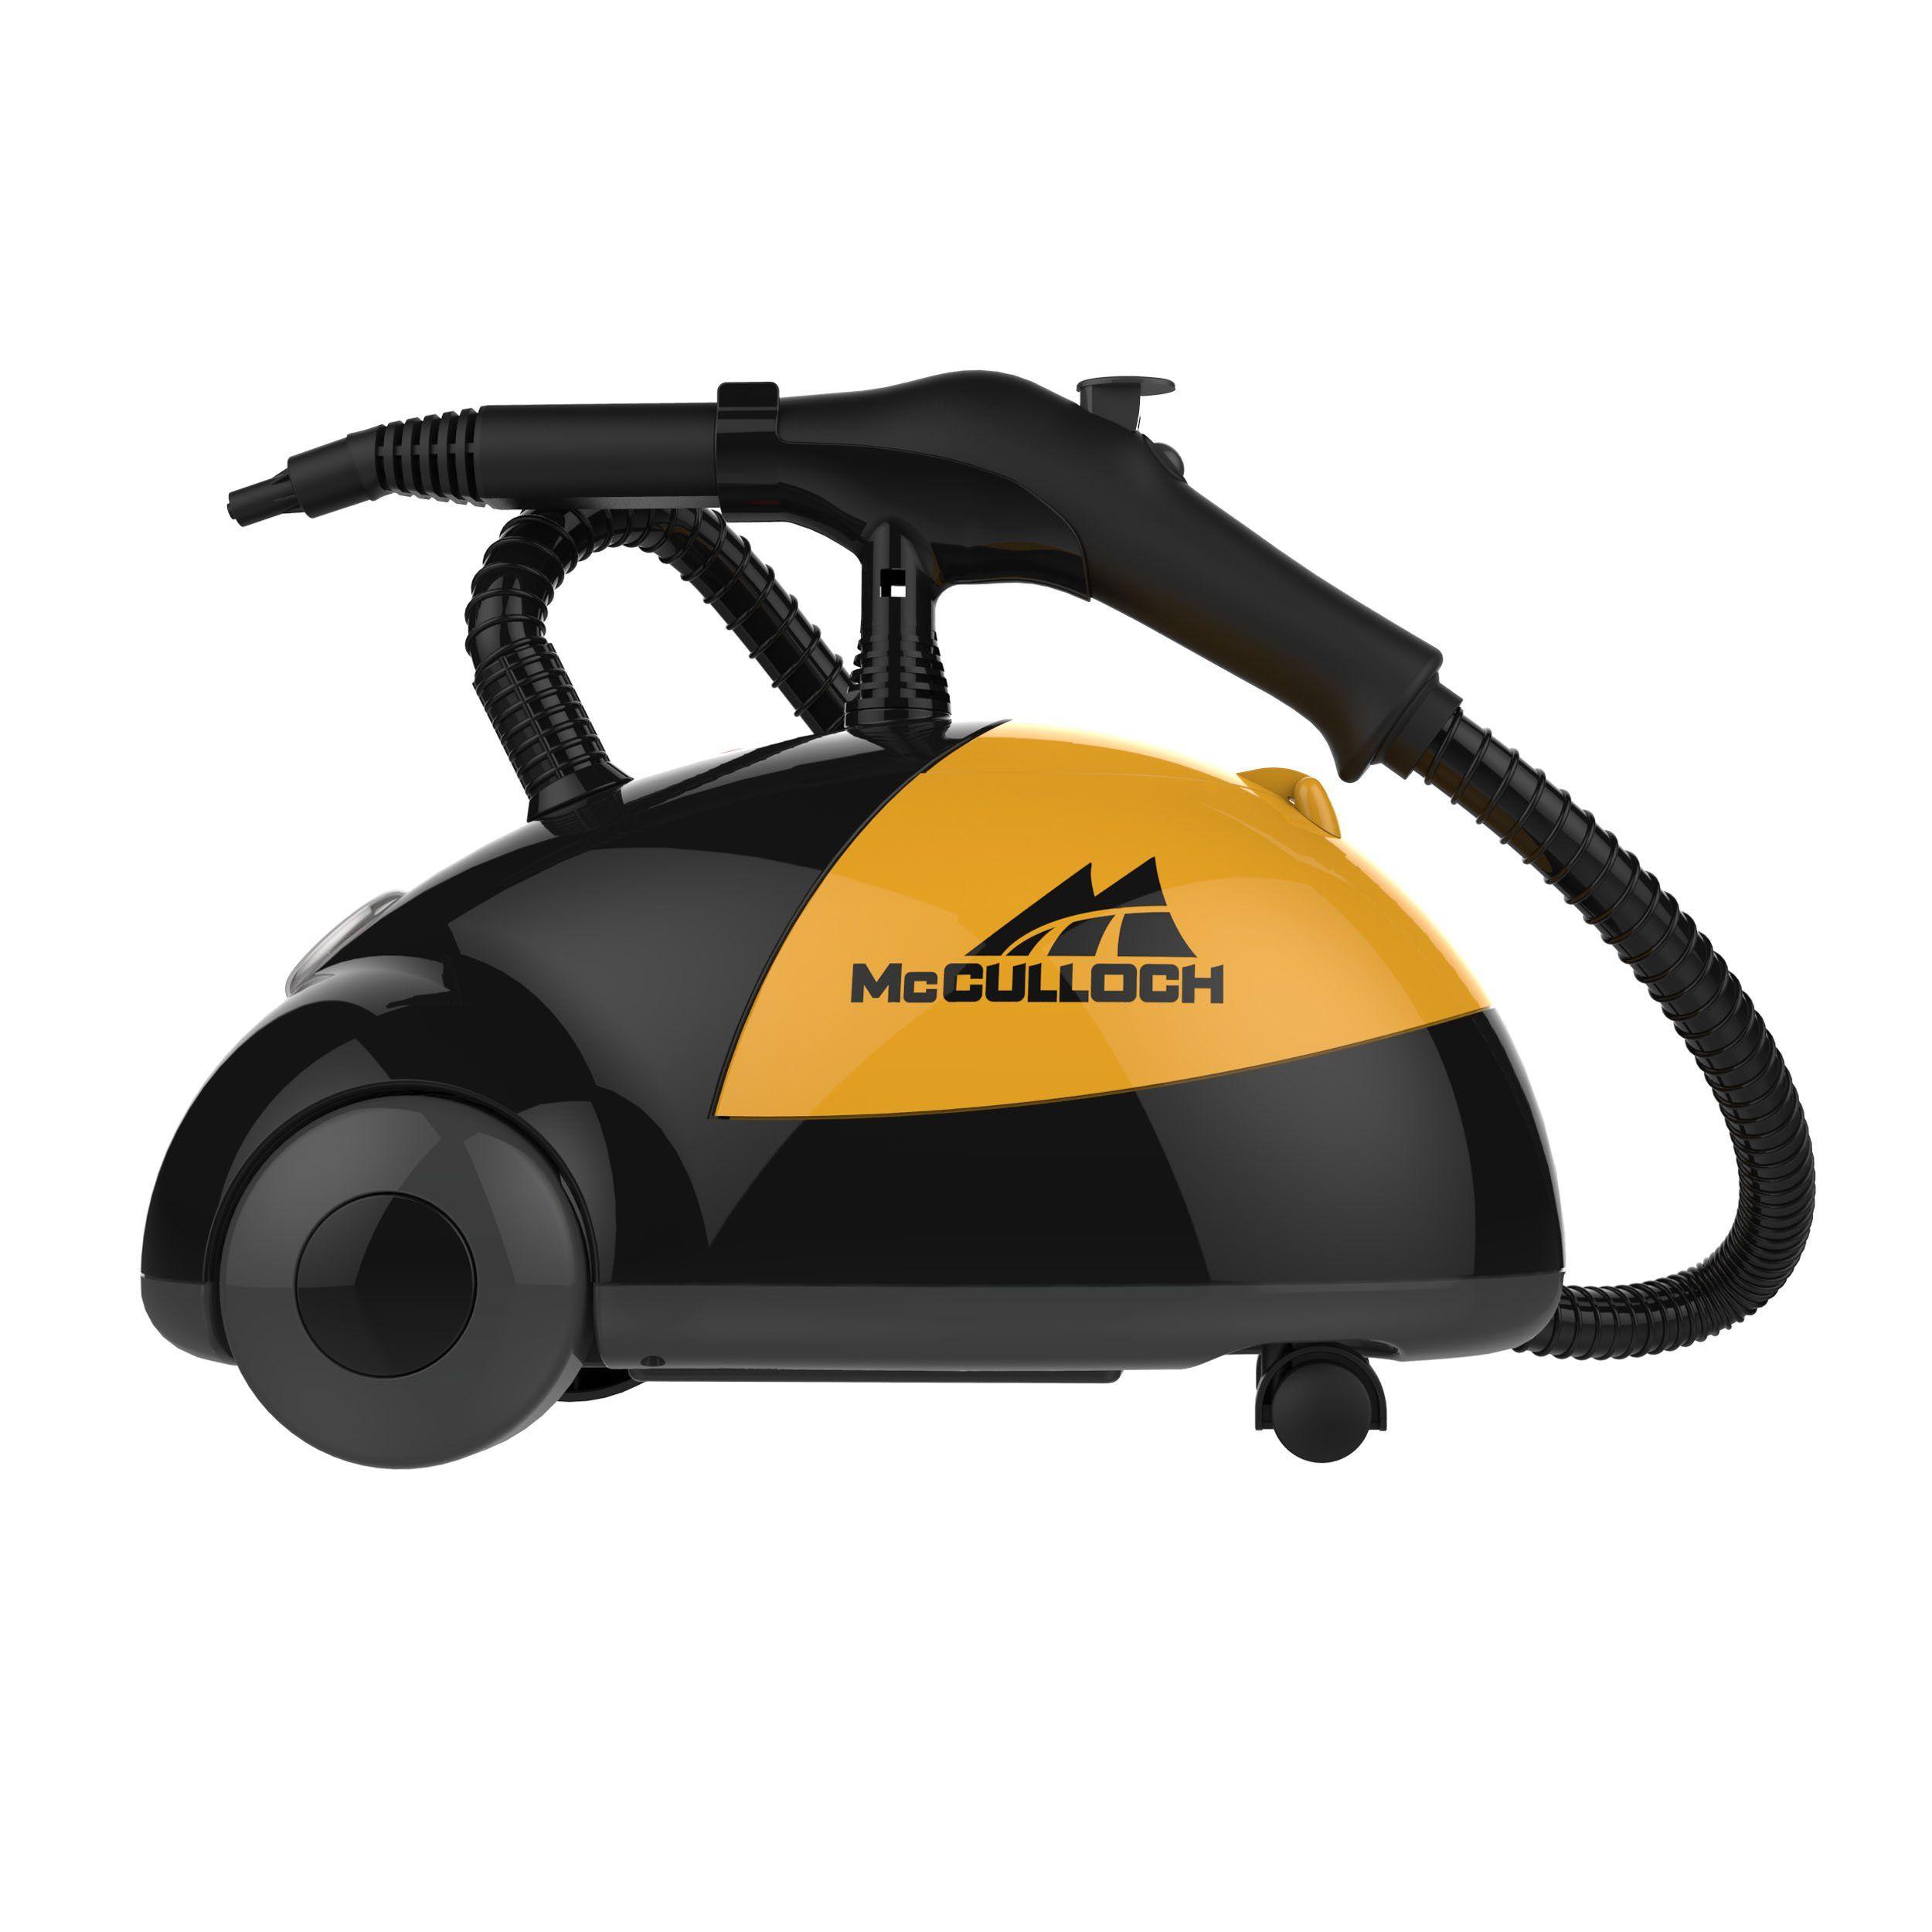 McCulloch MC1275 HeavyDuty Steam Cleaner >>> Click image